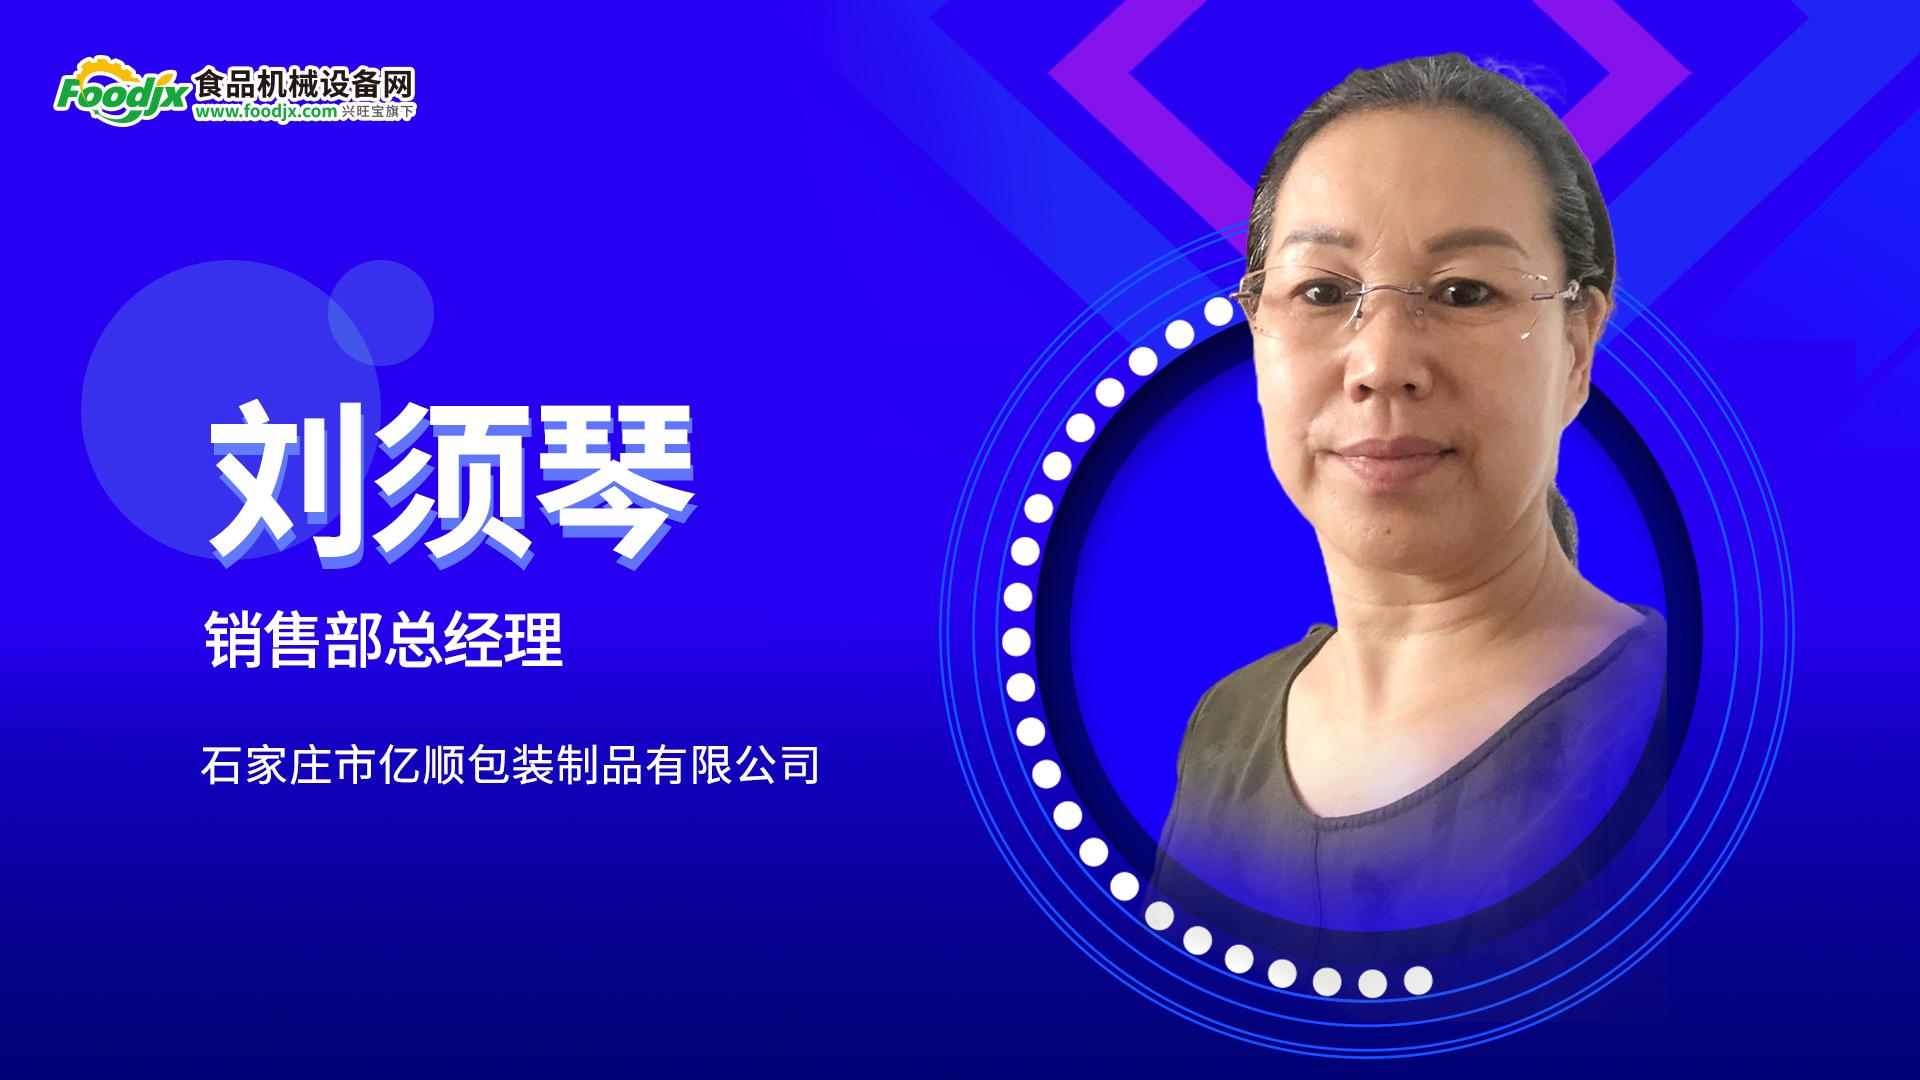 foodjx专访石家庄市亿顺包装制品有限公司